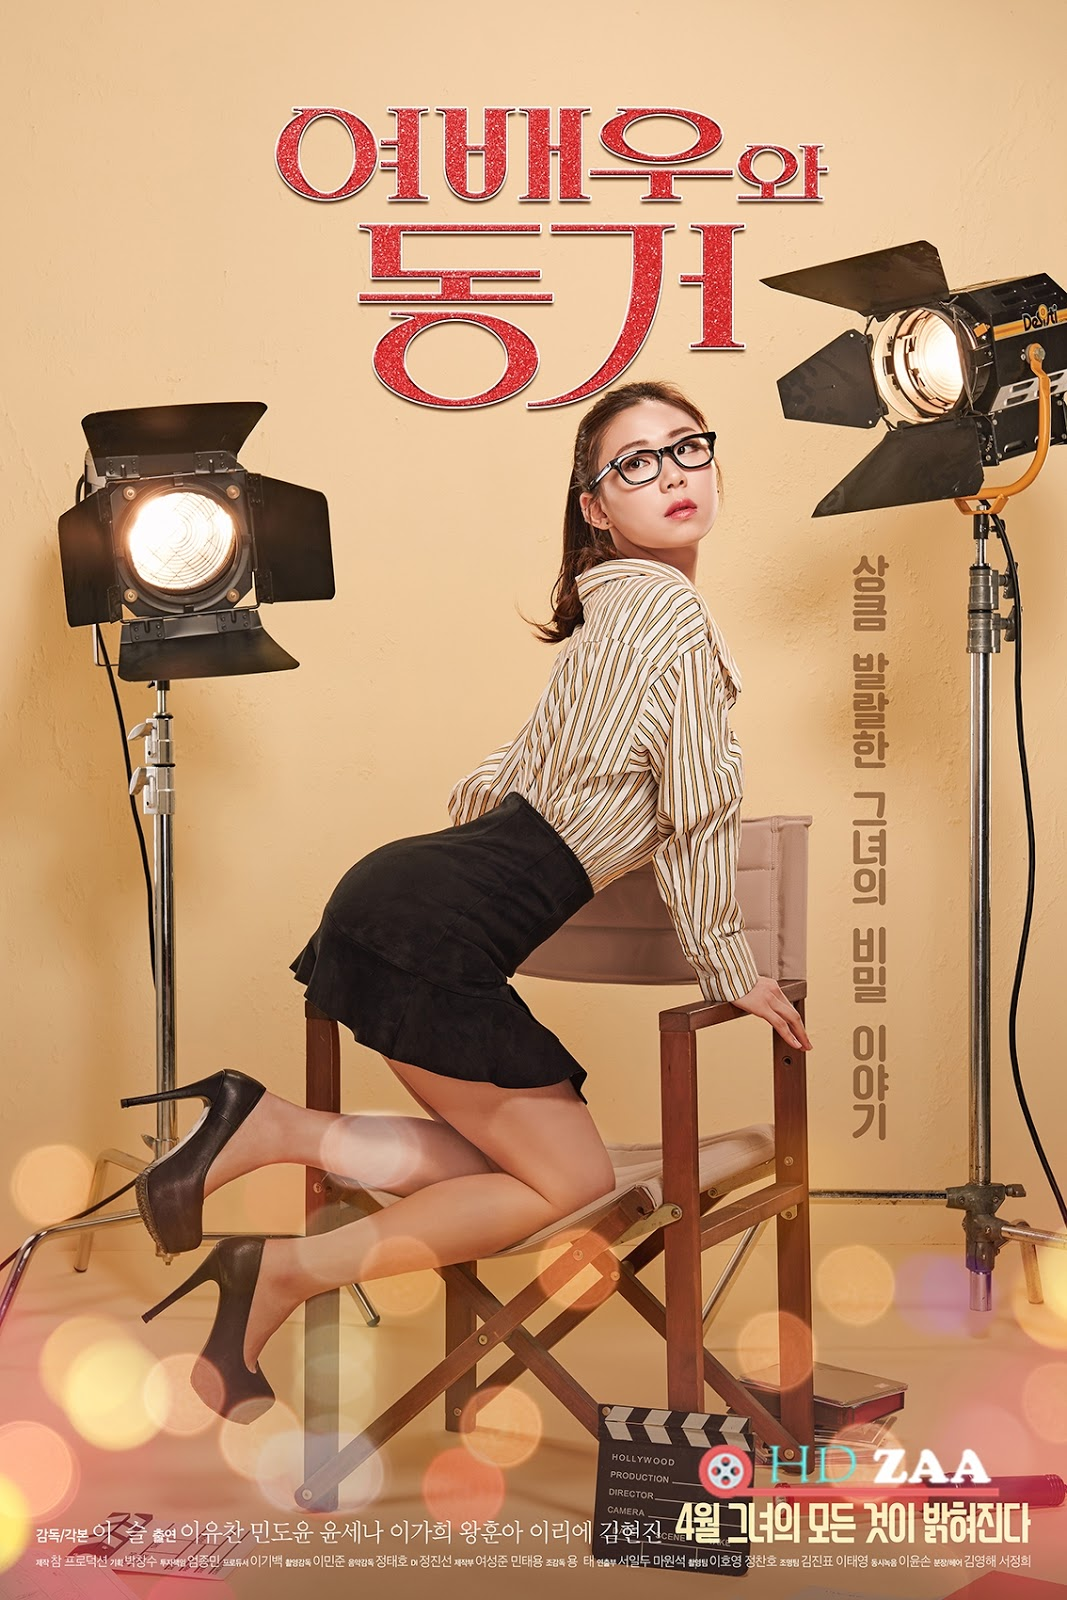 Live With An Actress (2017) [เกาหลี 18+] Soundtrack ไม่มีบรรยายไทย